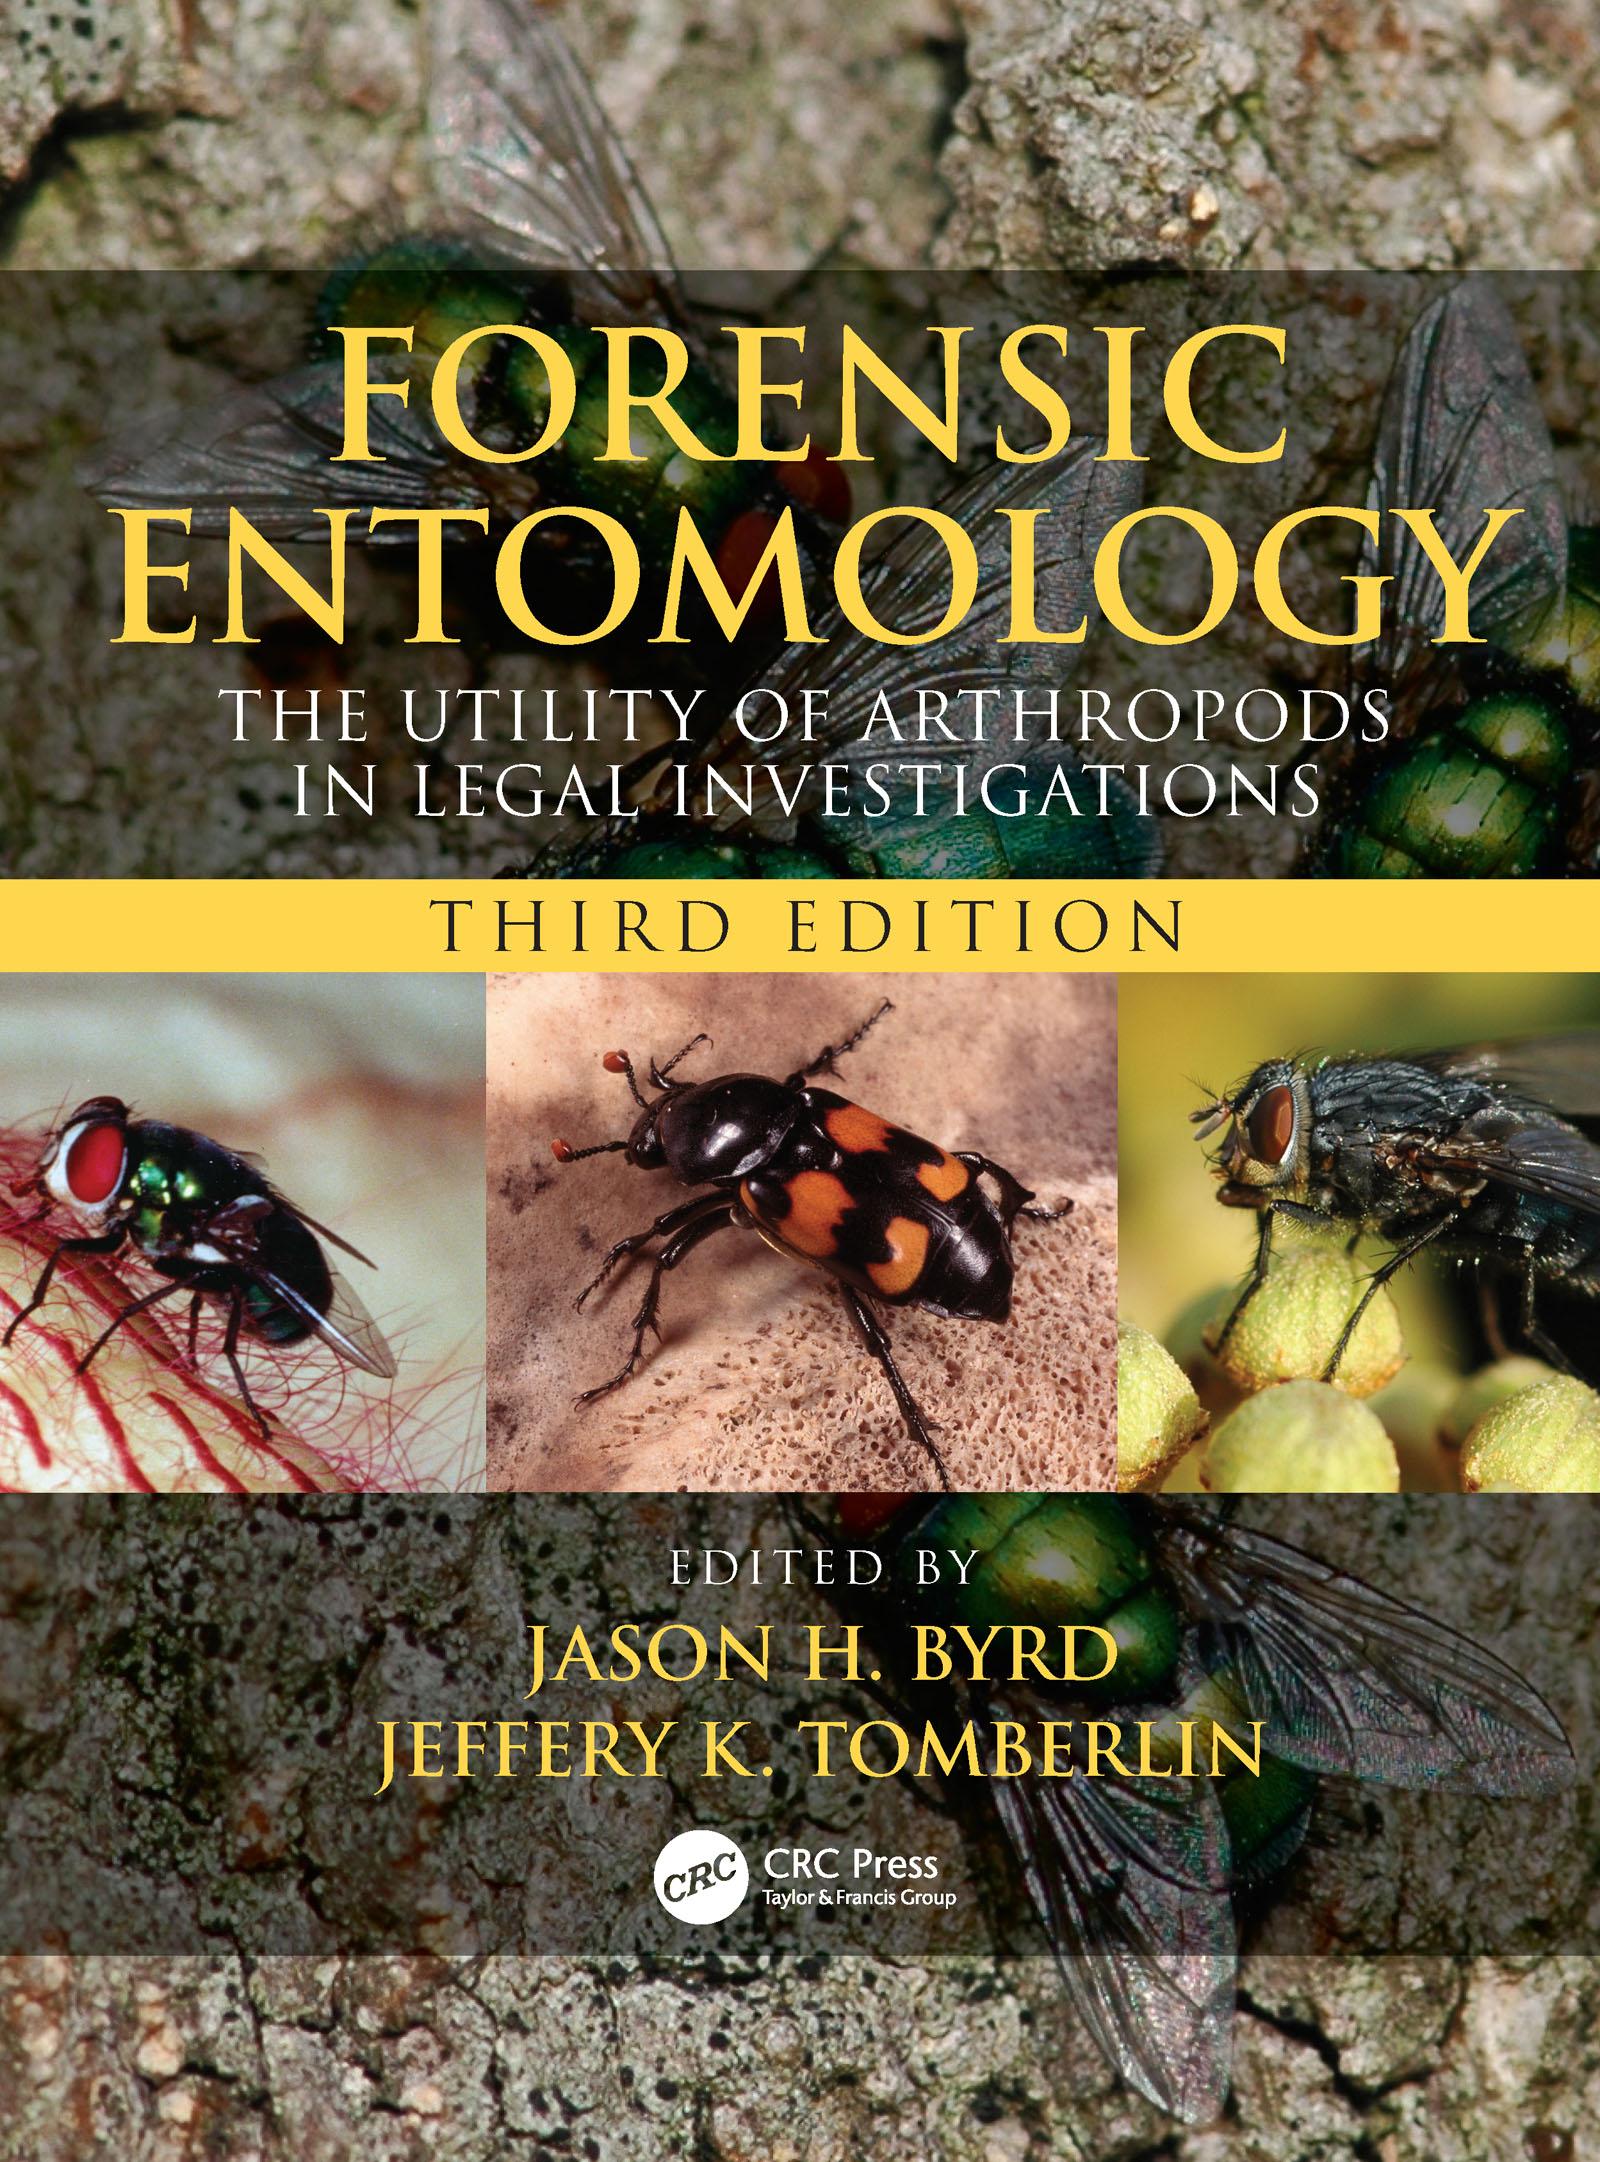 General Entomology and Basic Arthropod Biology